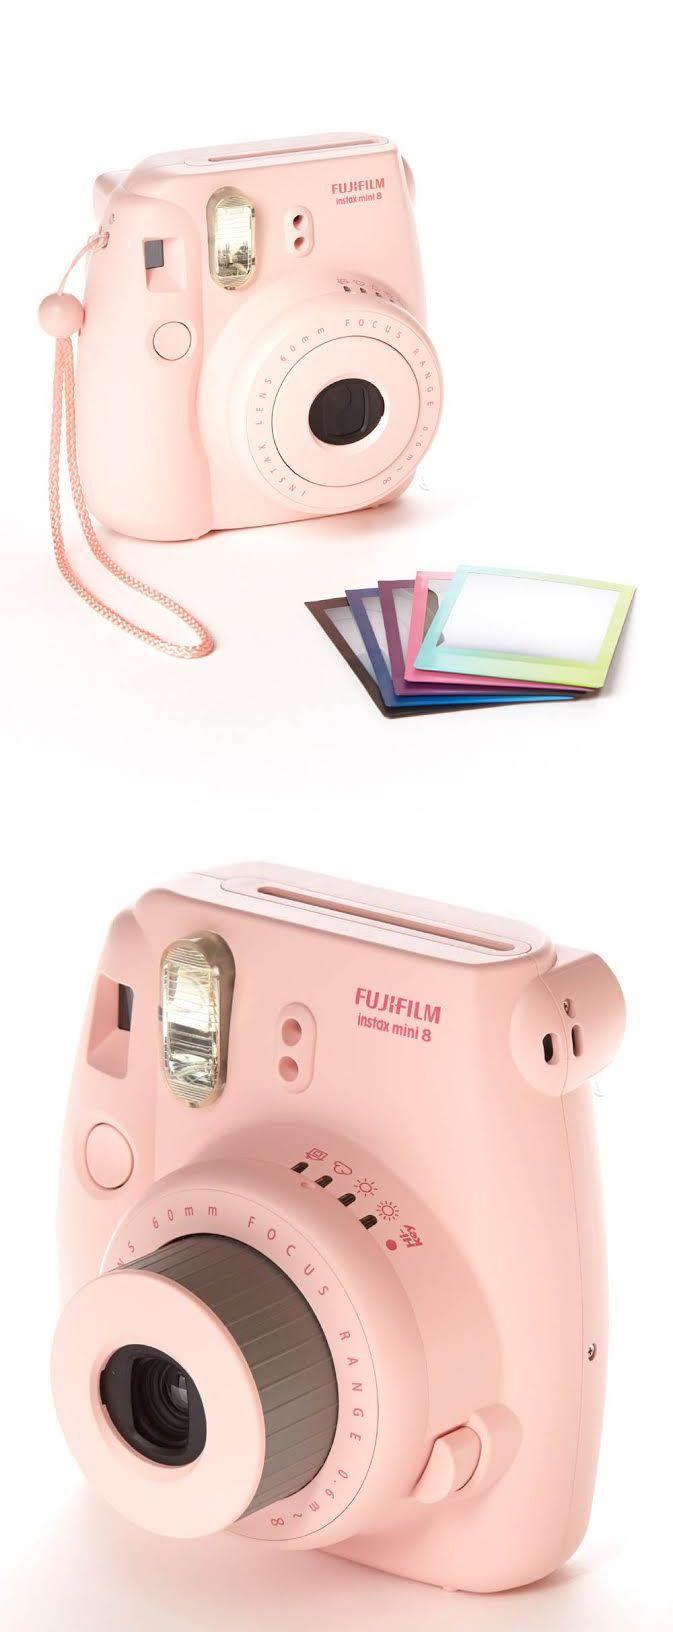 Fujiflim Instax Mini 8 Camera  Polaroid Film Set // so fun to have instant photos! #product_design